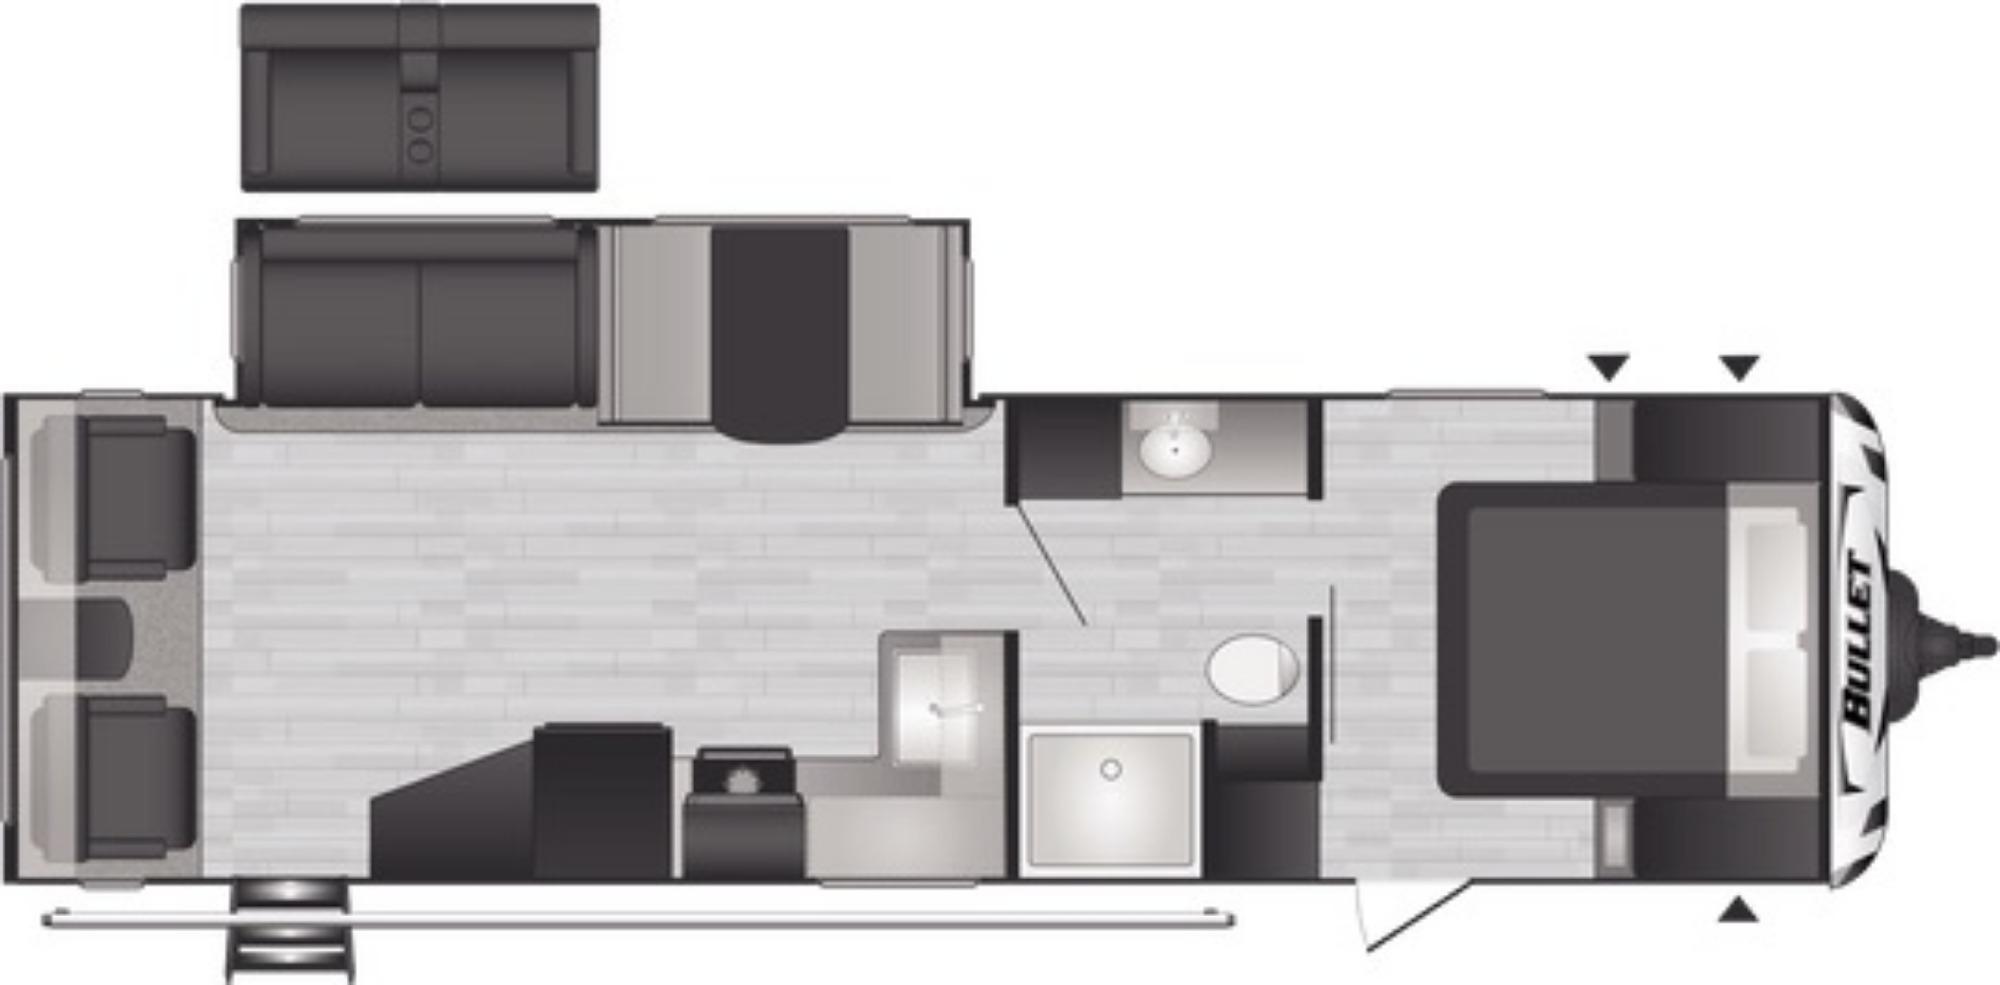 View Floor Plan for 2021 KEYSTONE BULLET 291RLSWE